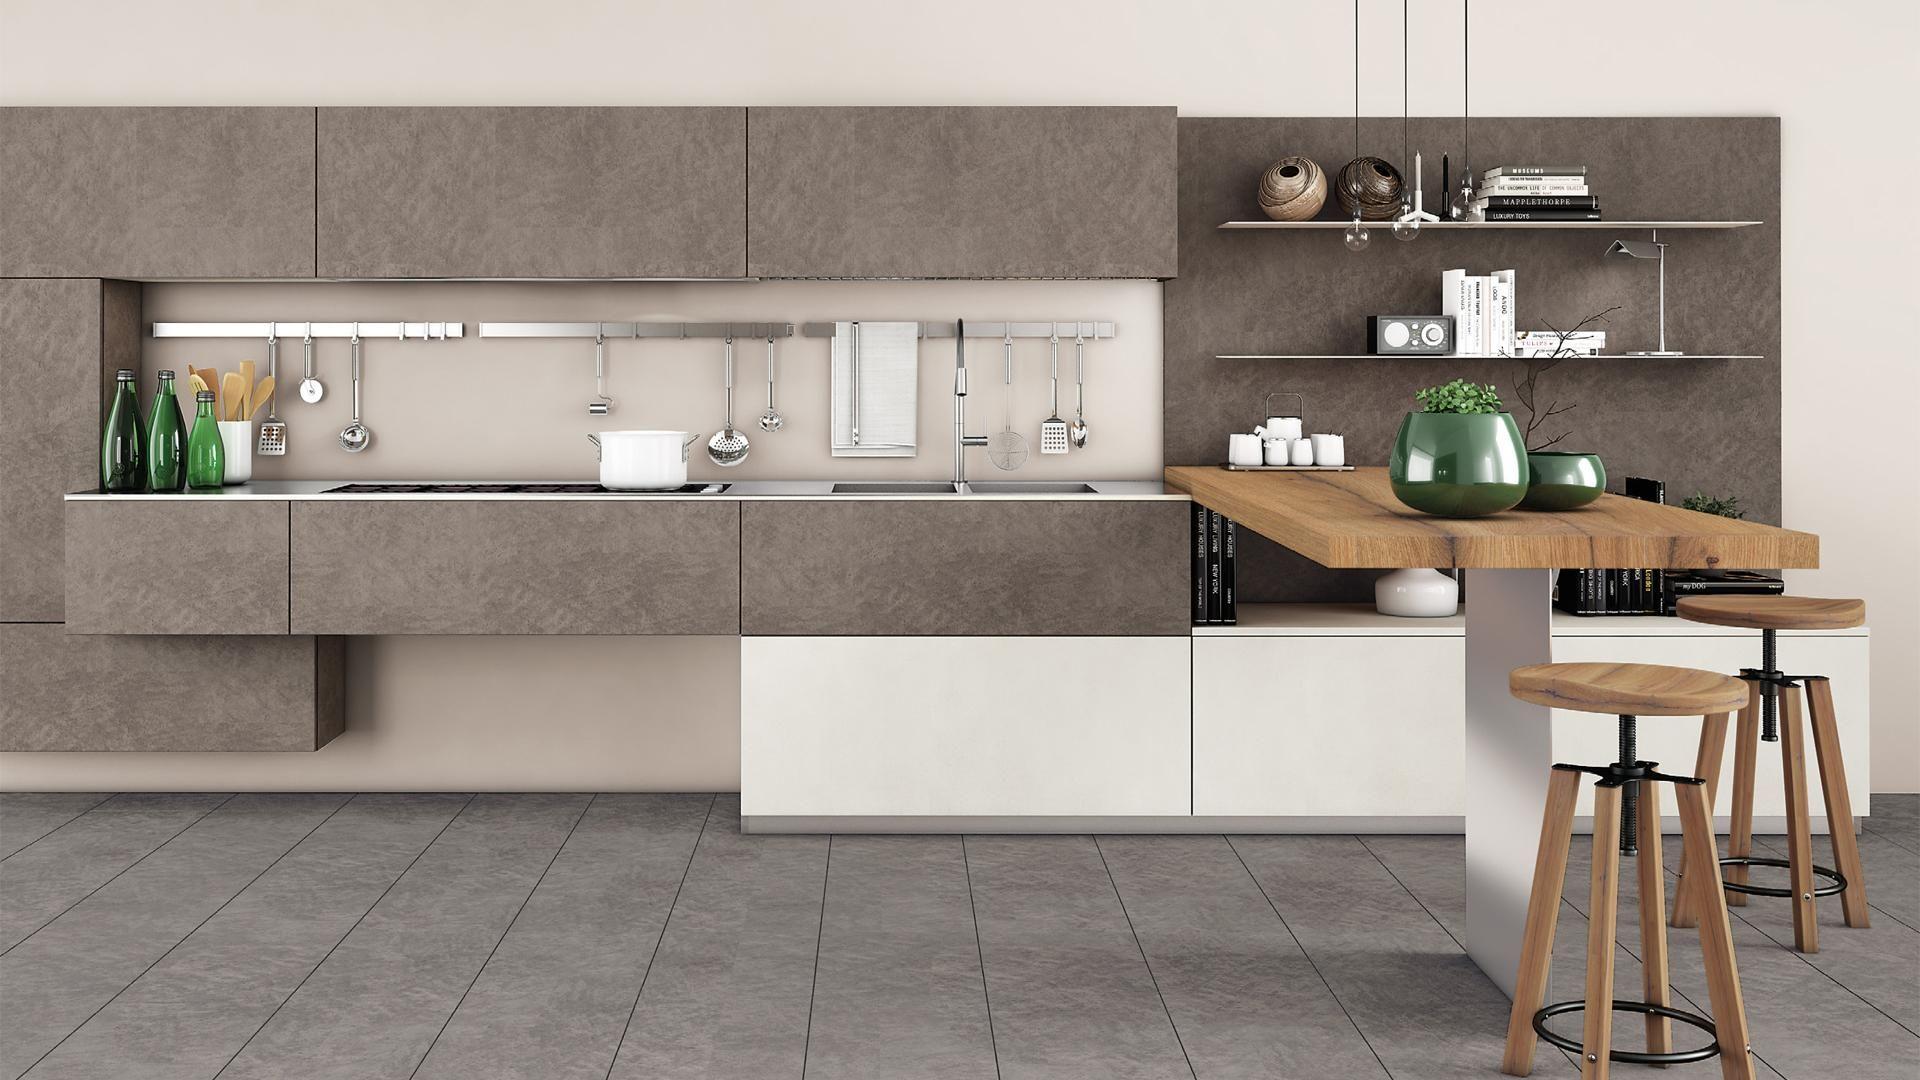 OLTRE - Cucina Lube Moderna | Cucine LUBE Torino